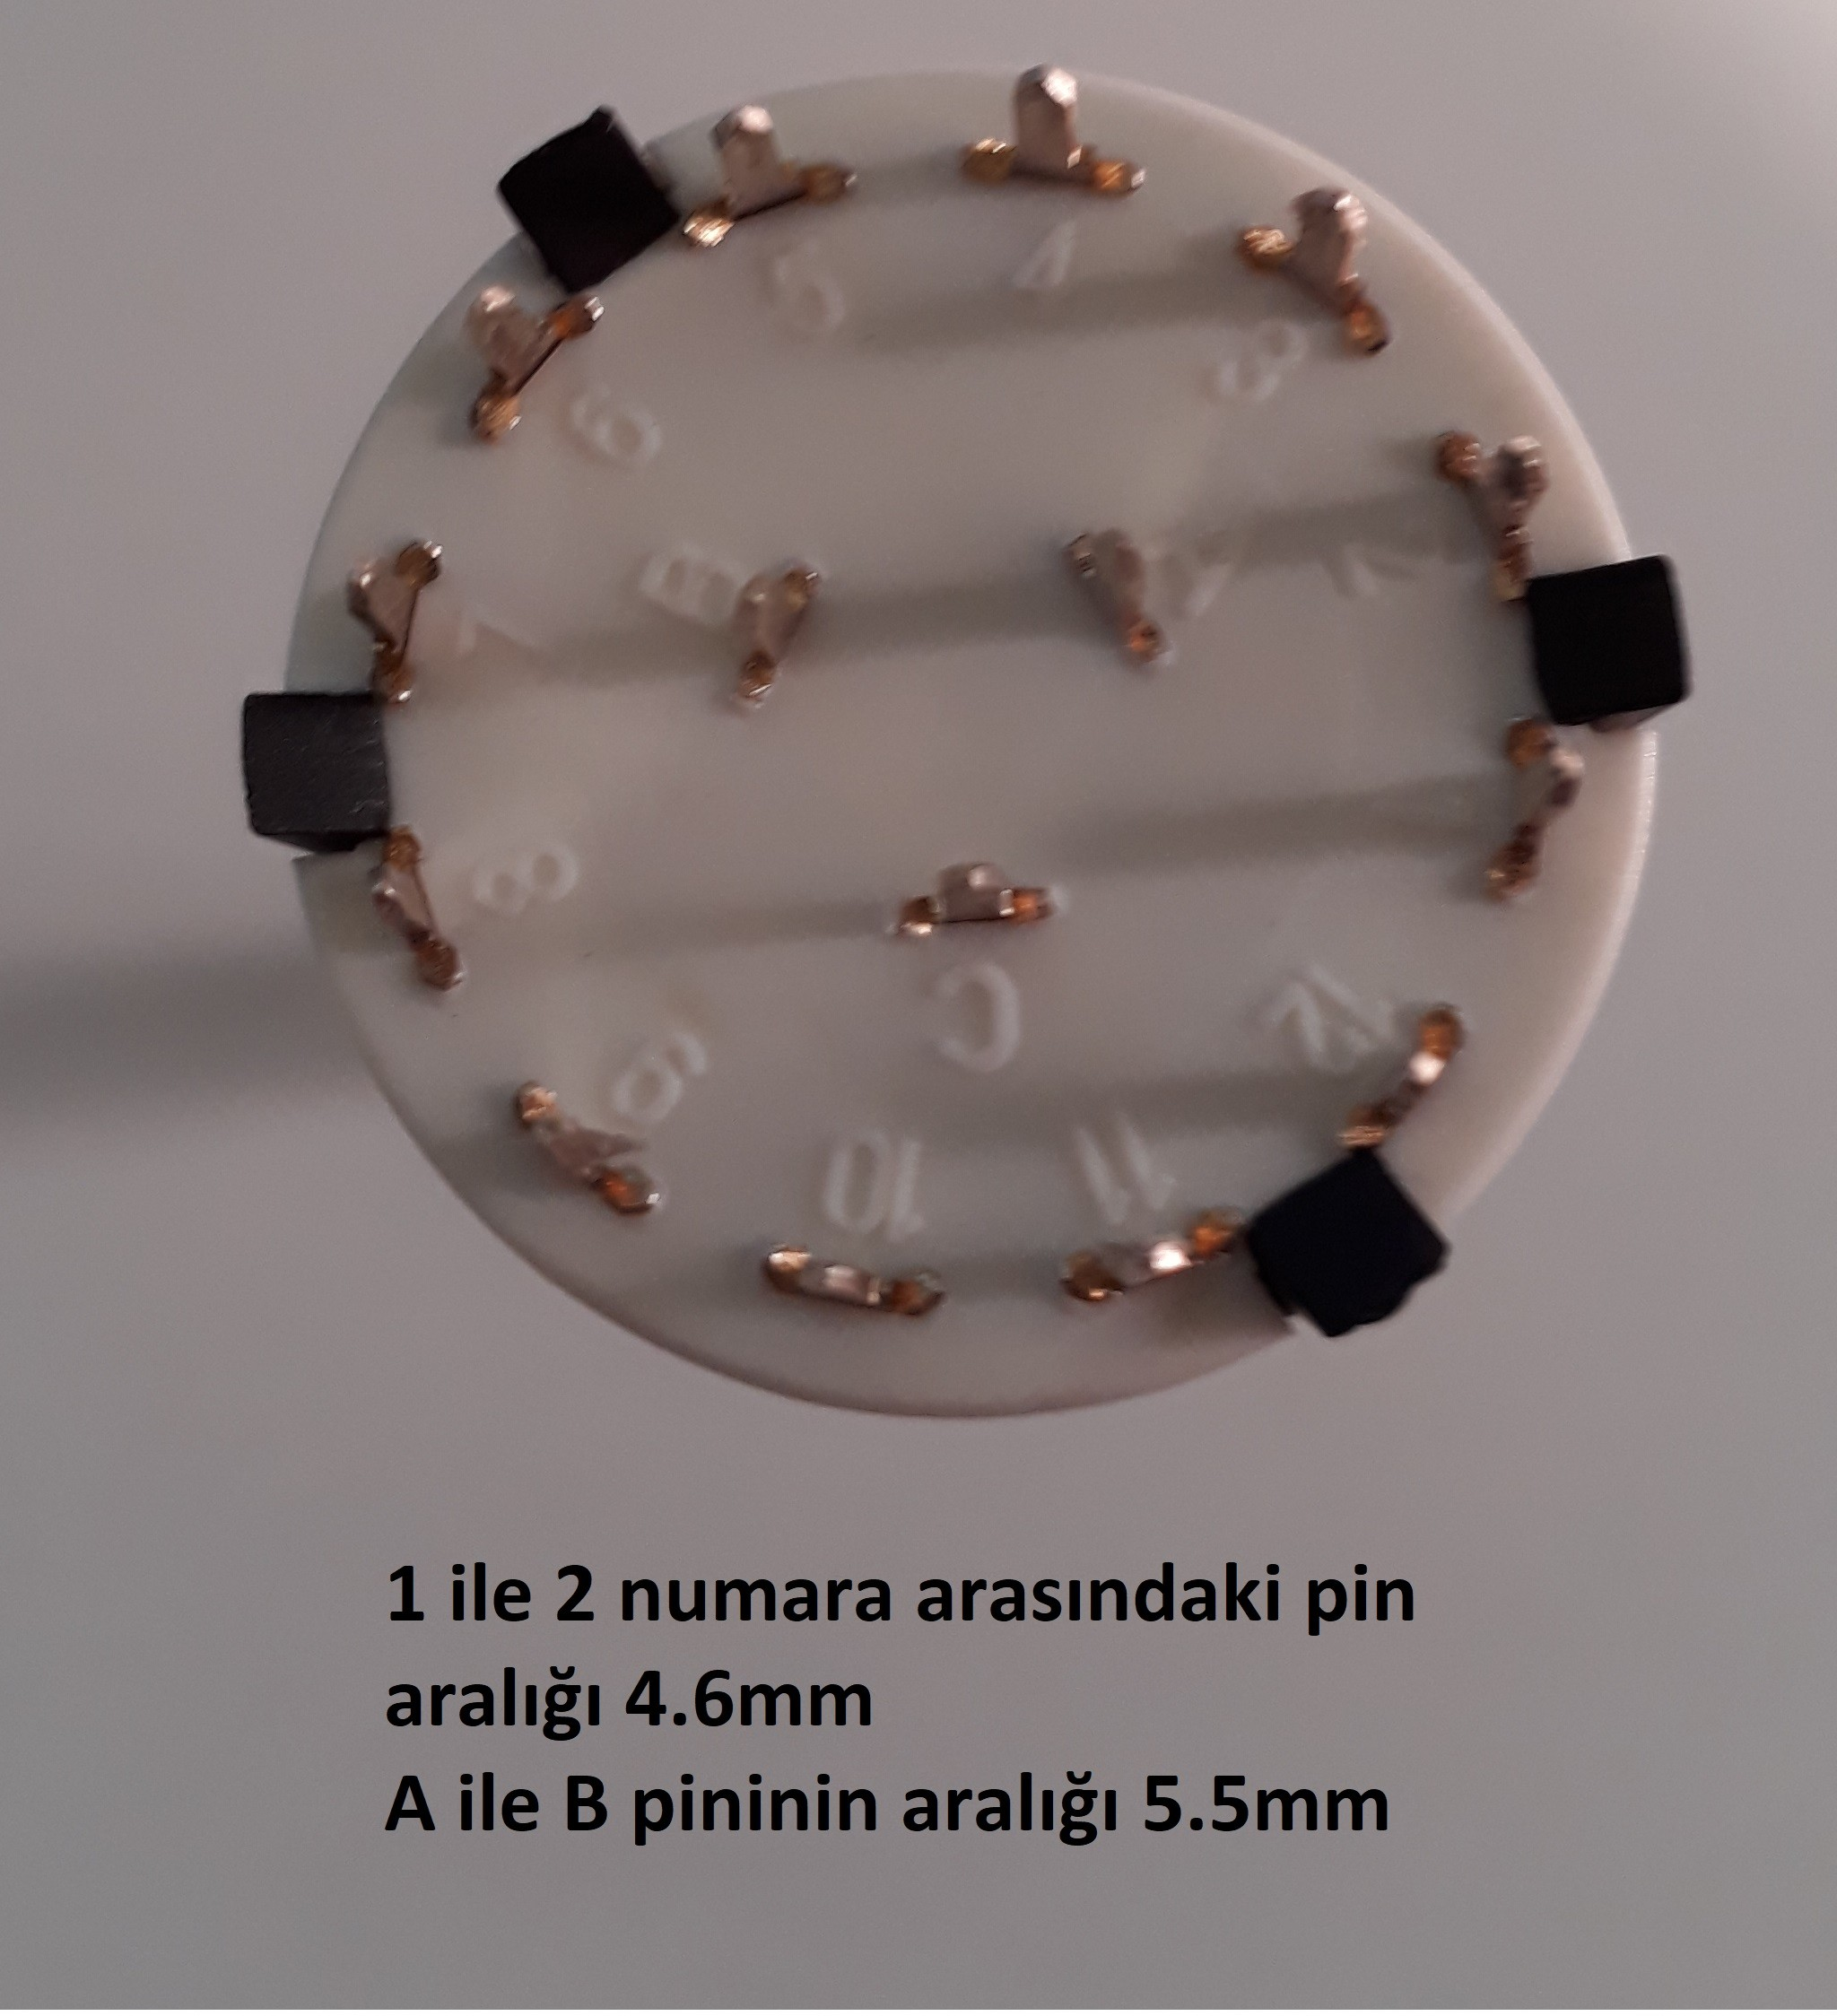 komütatör 3x4 kademeli potansiyometre pin aralığı